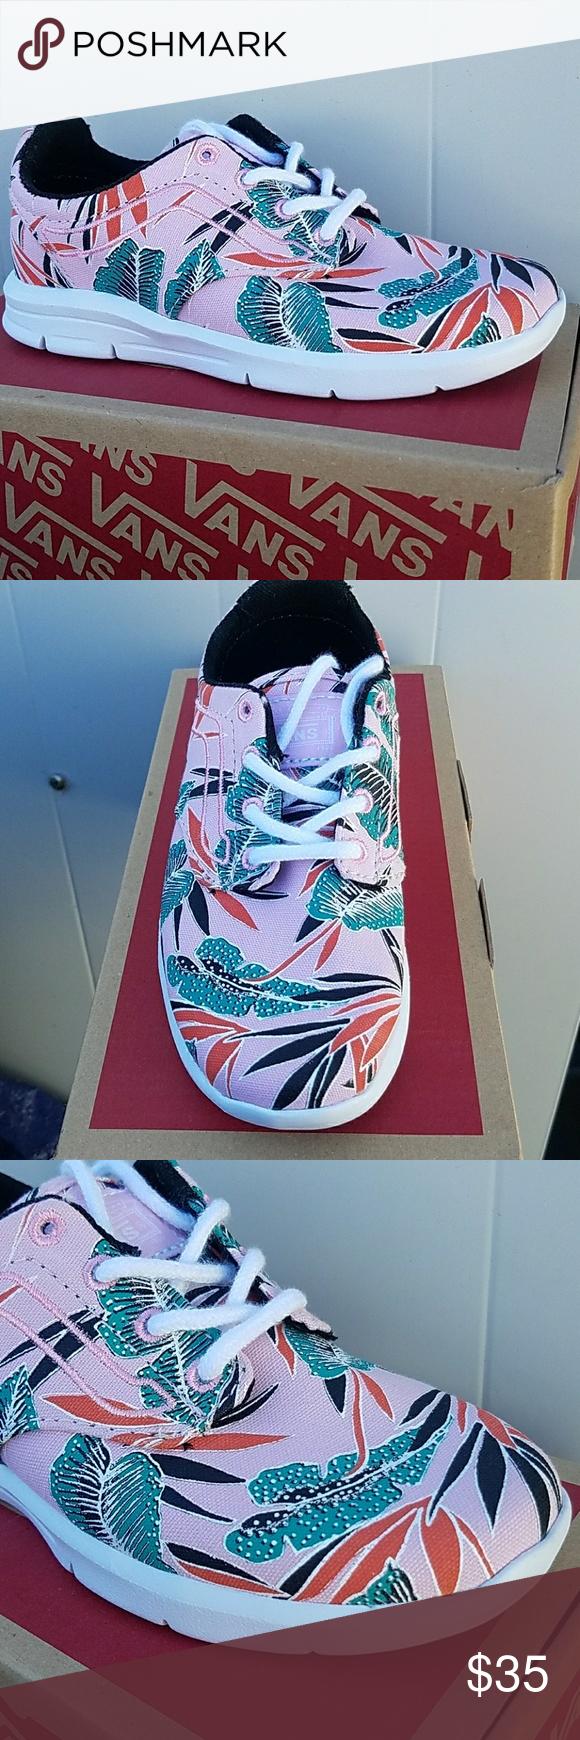 cb8c7ac049 Vans Iso 1.5 Tropical Vans with ultra cush lite tropical pink leave design Vans  Shoes Sneakers